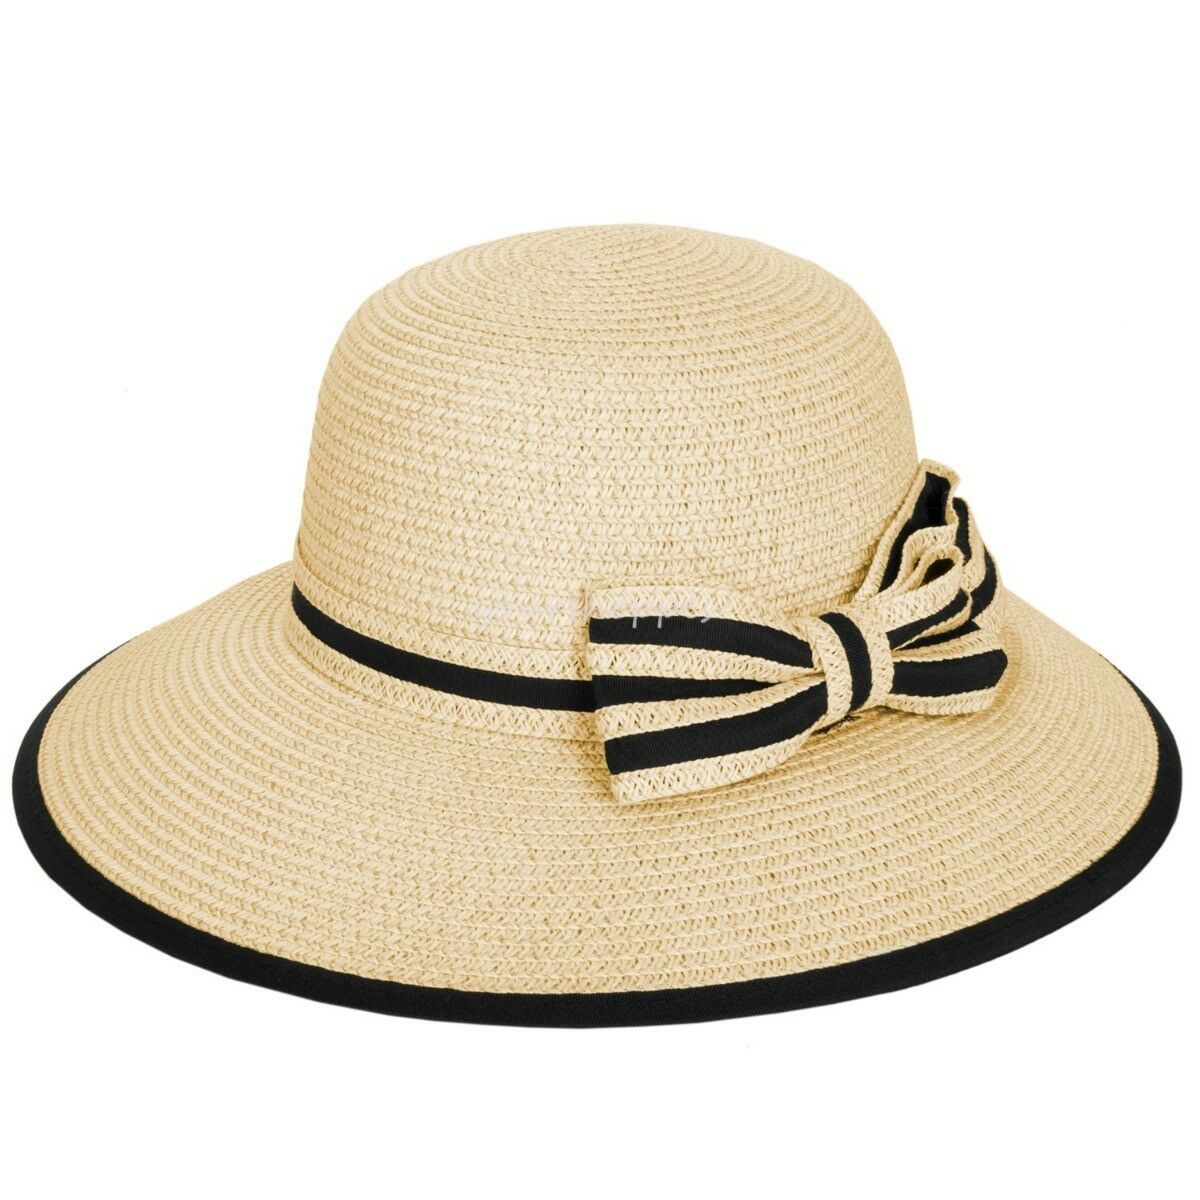 Details about Khaki Color Fashion Women Straw Floppy Hat Wide Brim Bow Sun  Beach Summer Cap 752859e88542